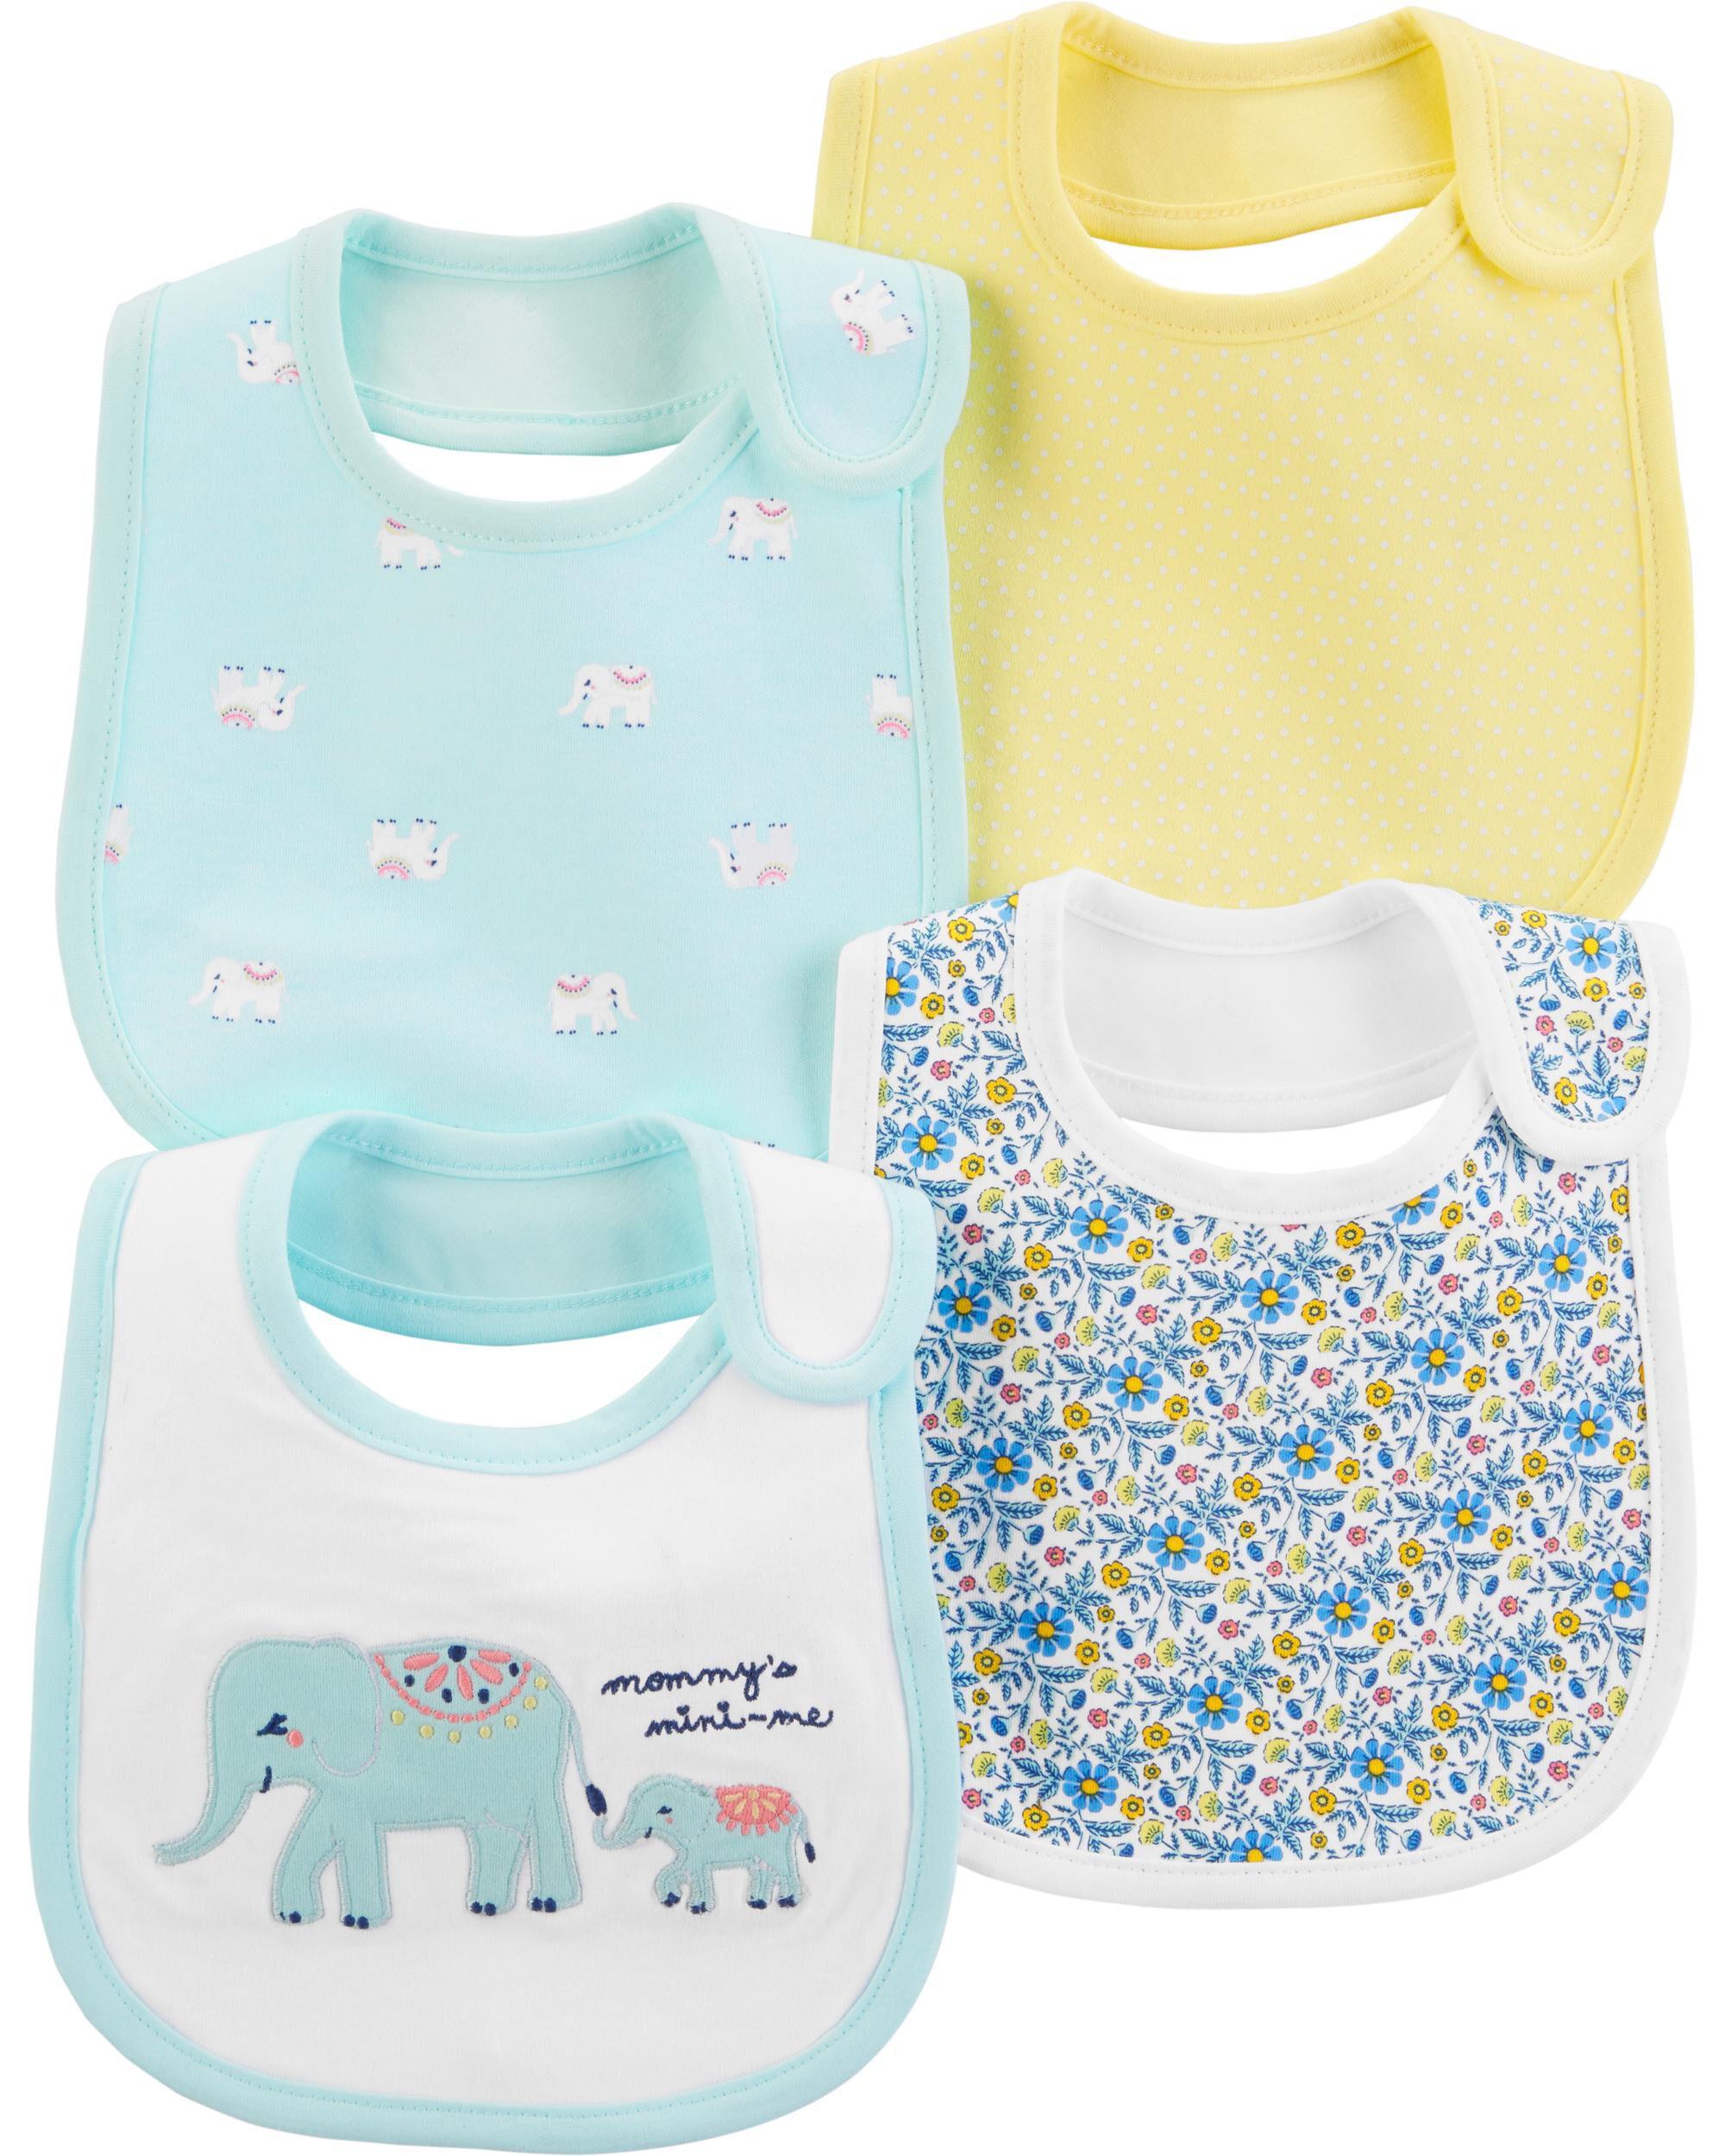 b11dd0fd0 4-Pack Elephant Teething Bibs. Loading zoom